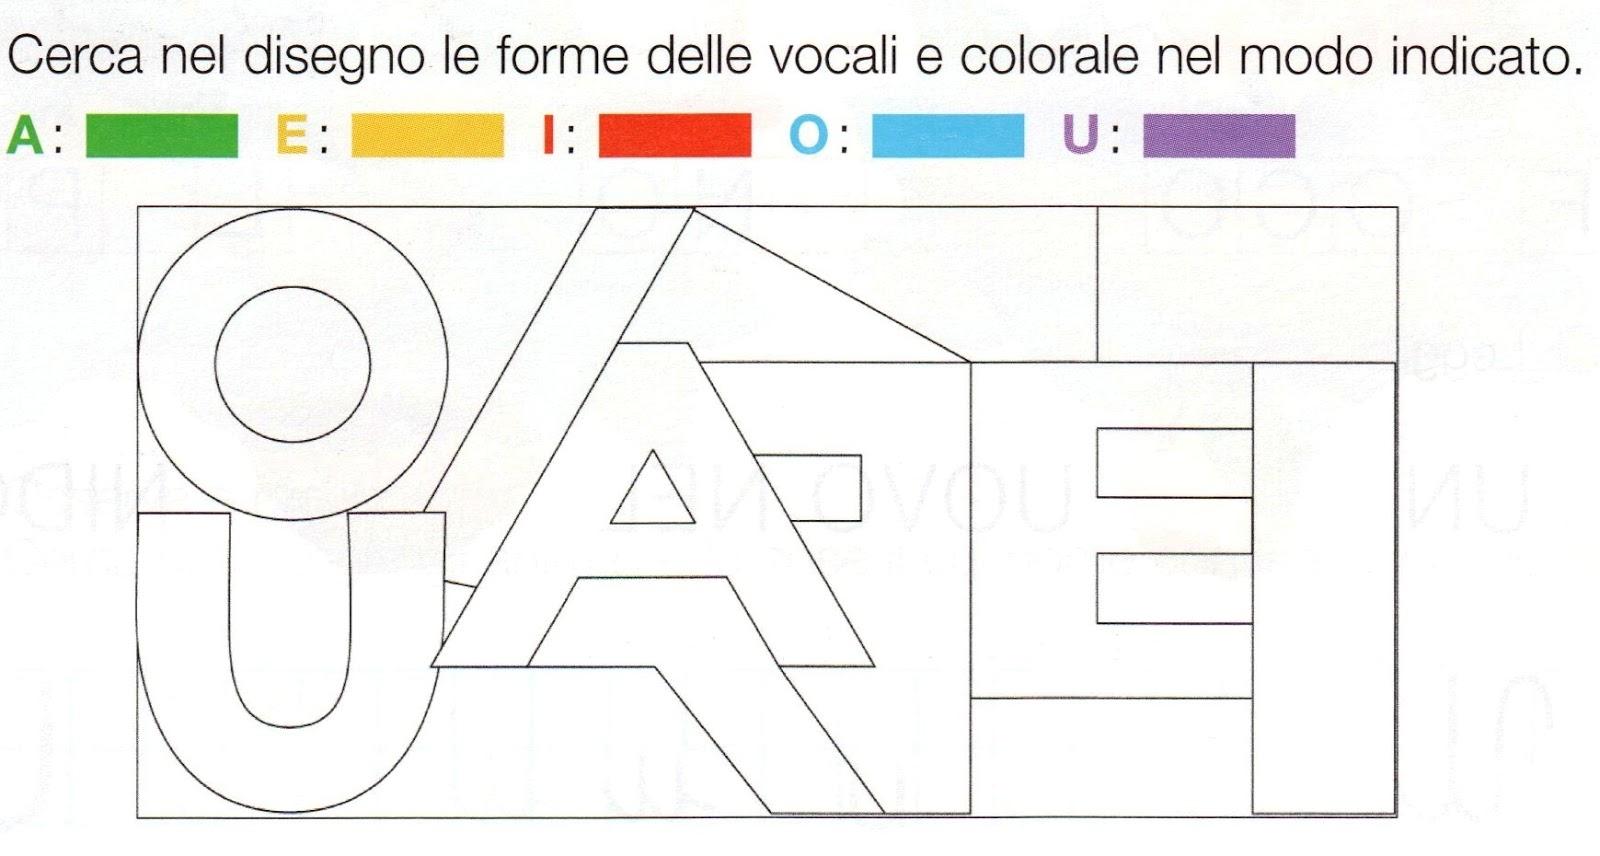 Lavoro Sulle Vocali Lessons Tes Teach